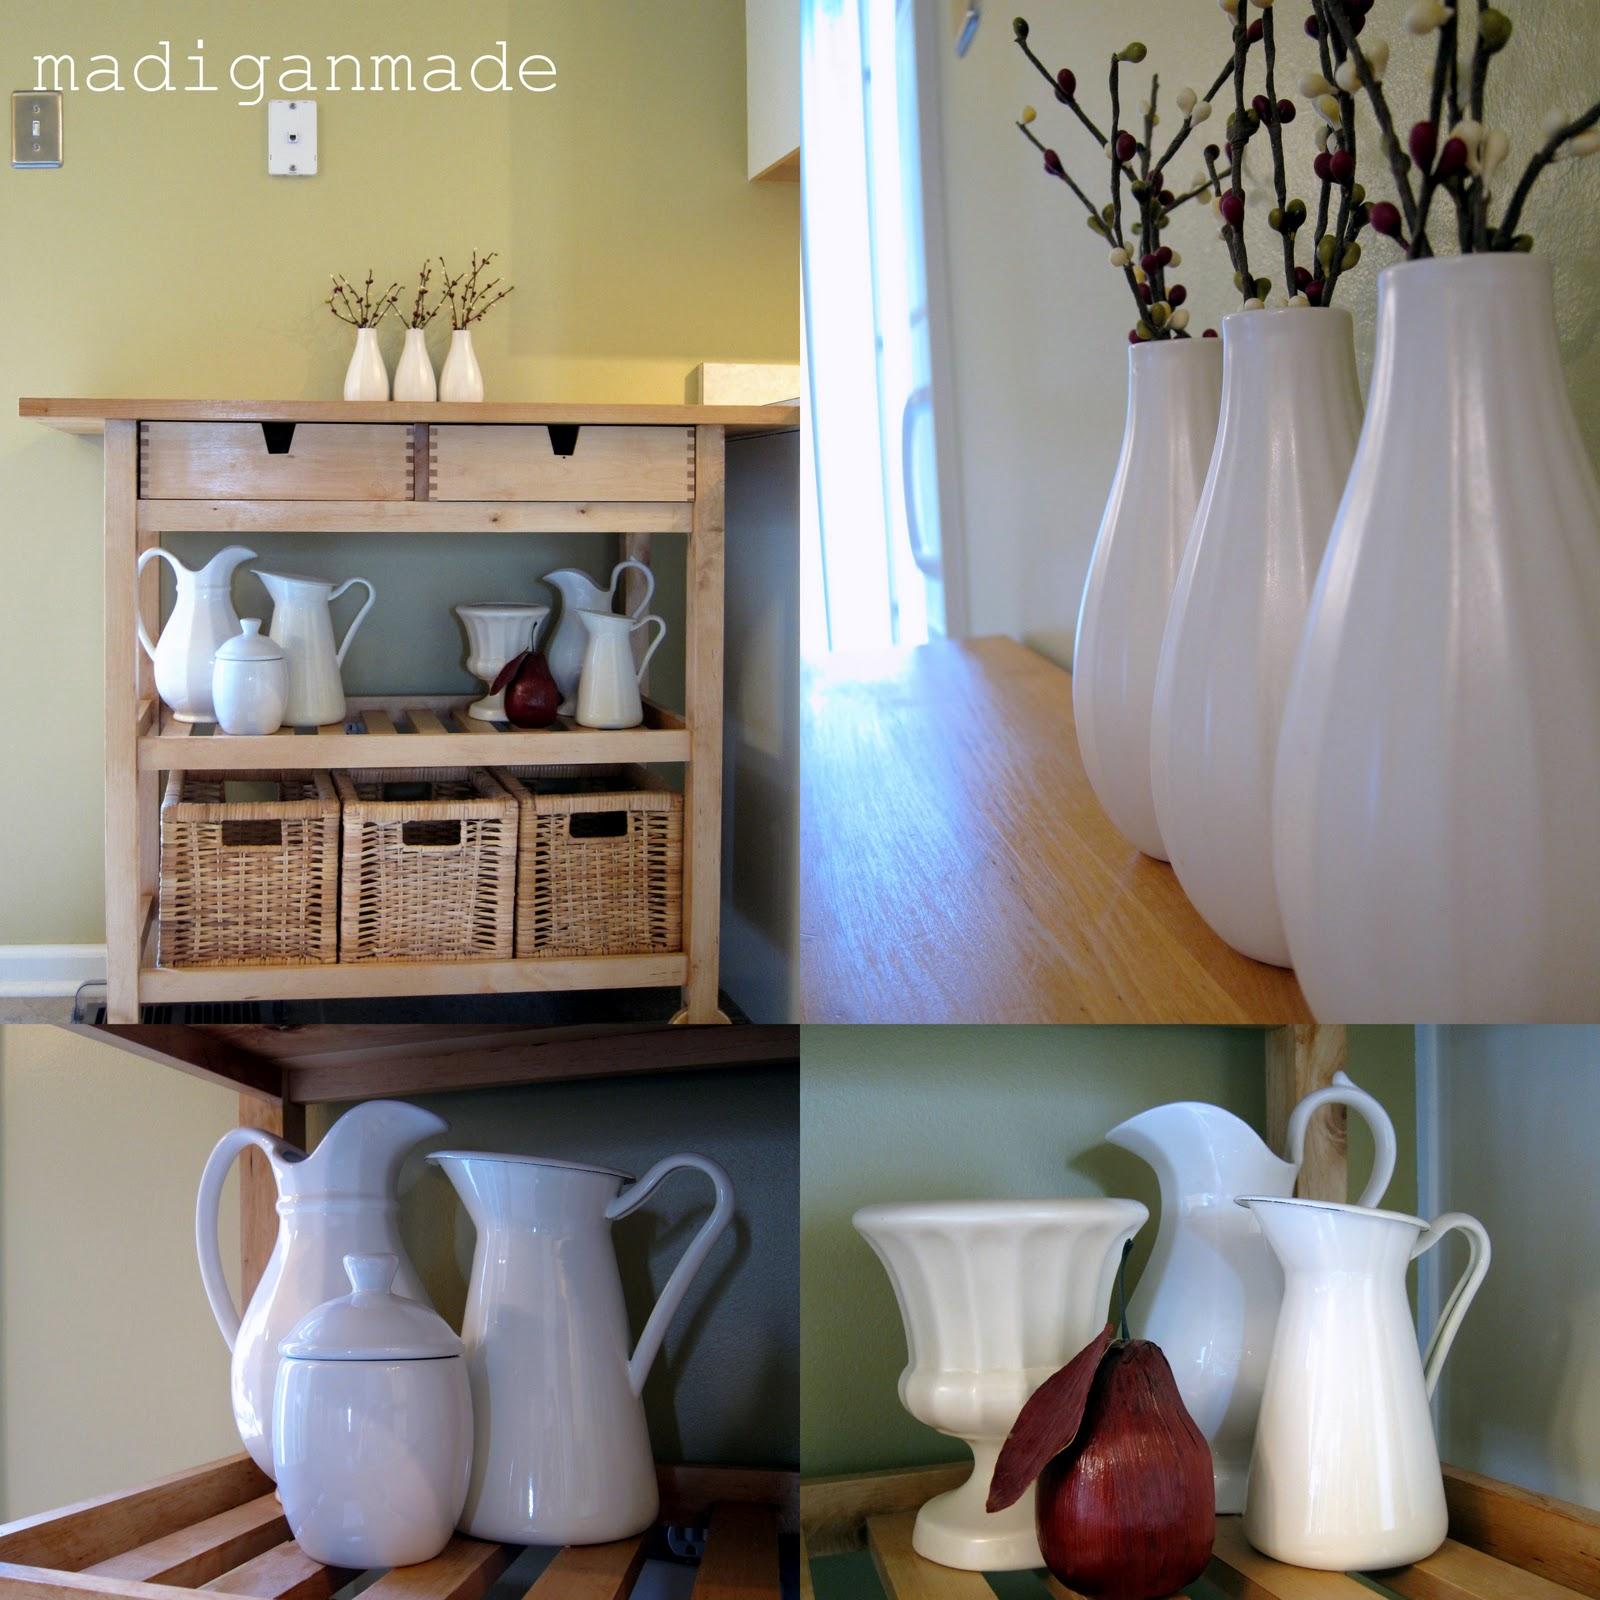 https://i1.wp.com/4.bp.blogspot.com/_xd5aEjCcjL4/TSCerHj51mI/AAAAAAAABVY/1UmOjYhWb7w/s1600/pottery.jpg